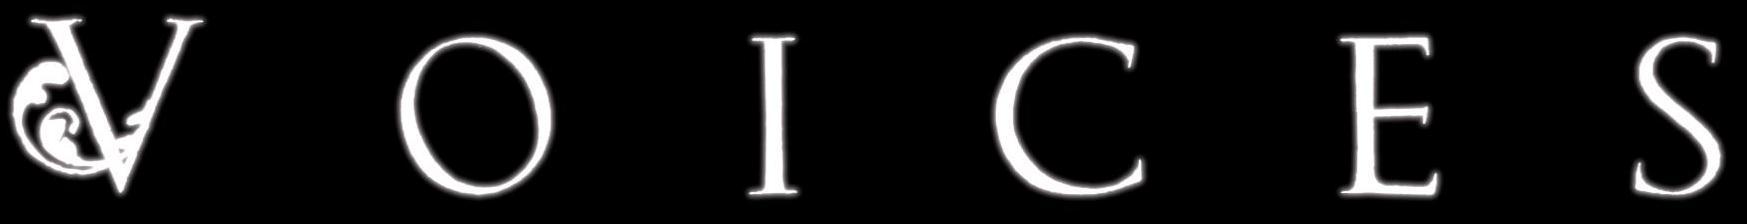 Voices - Logo